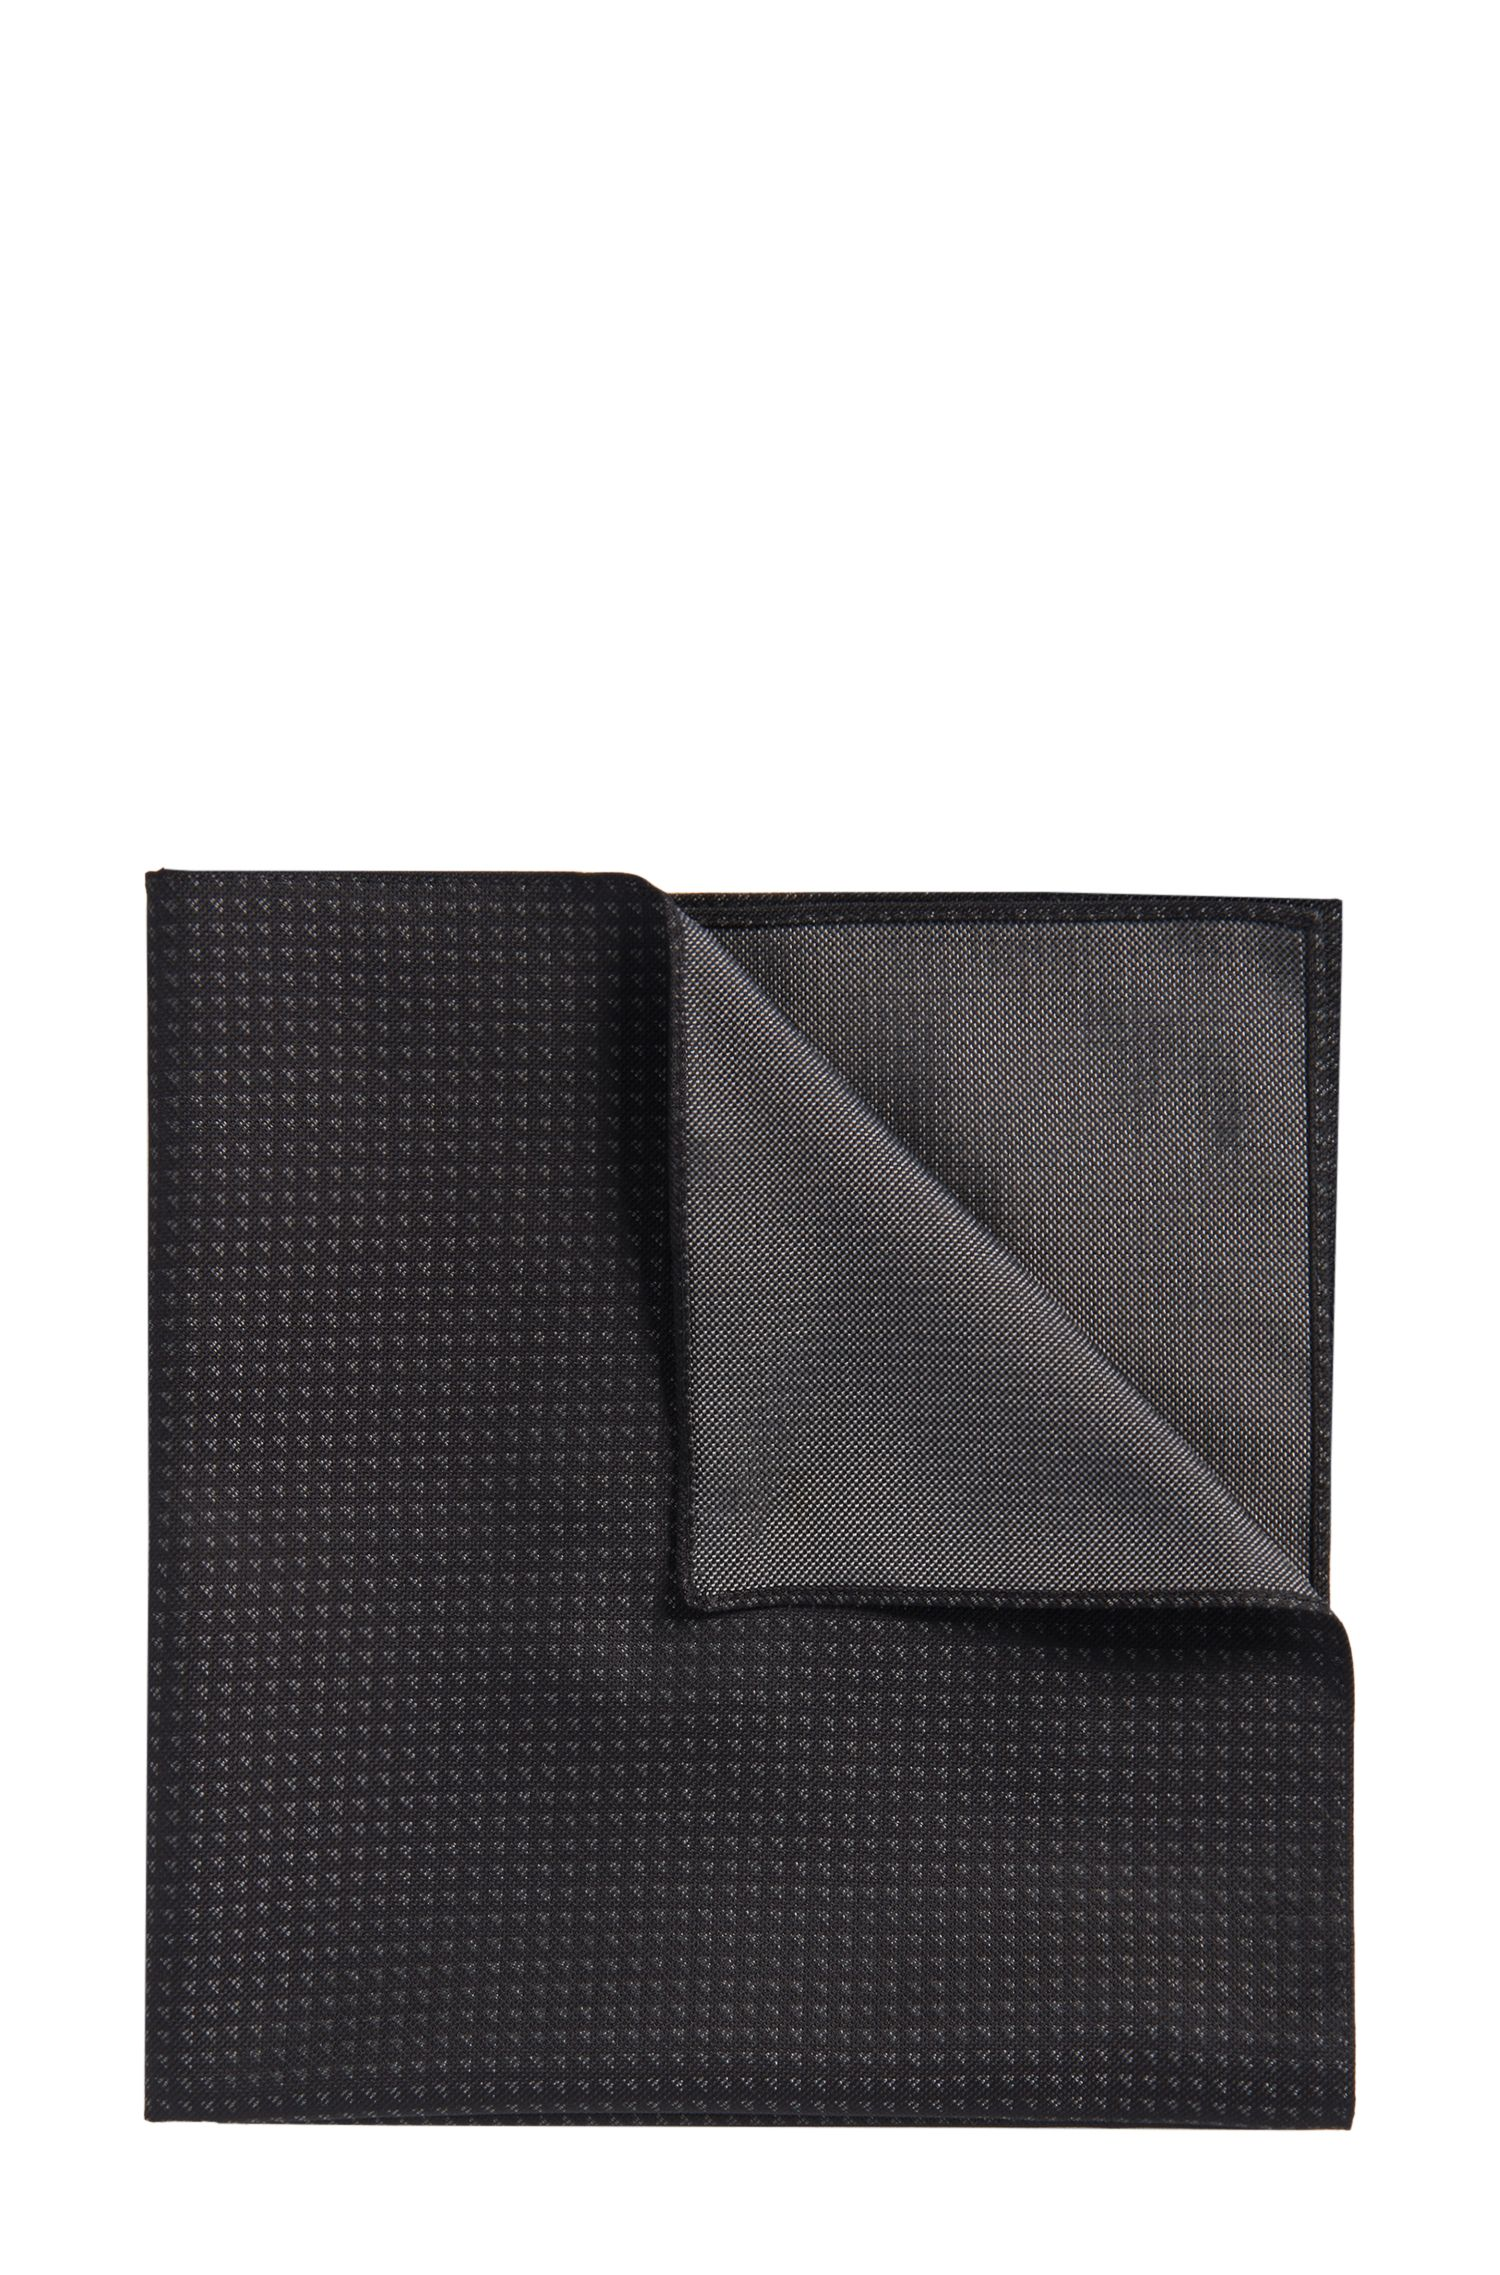 'Pocket sq. cm 33x33' | Geo Patterned Pocket Square